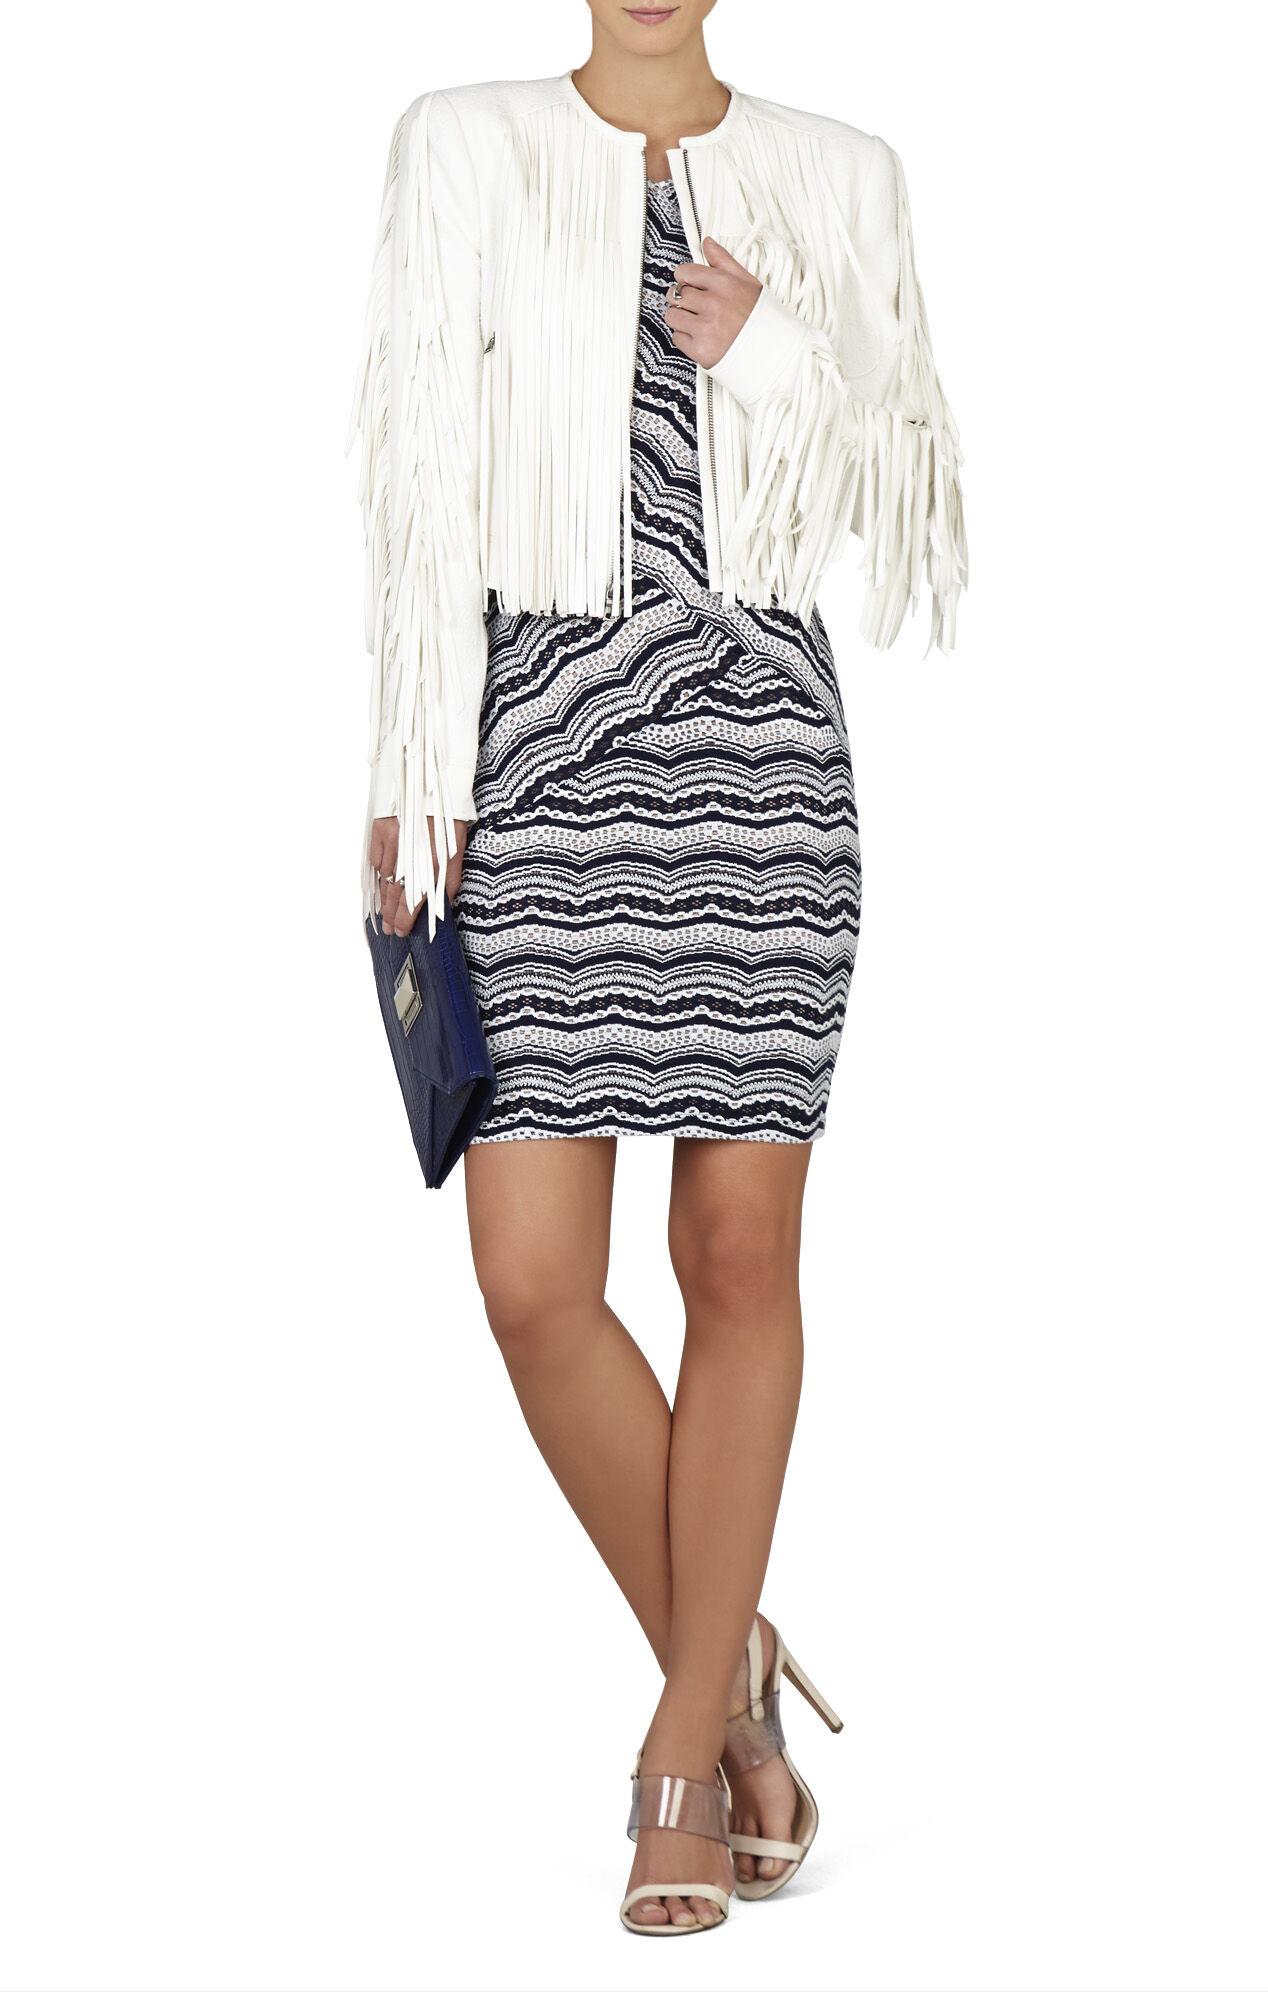 Melysa Long-Sleeve Scalloped Lace Dress